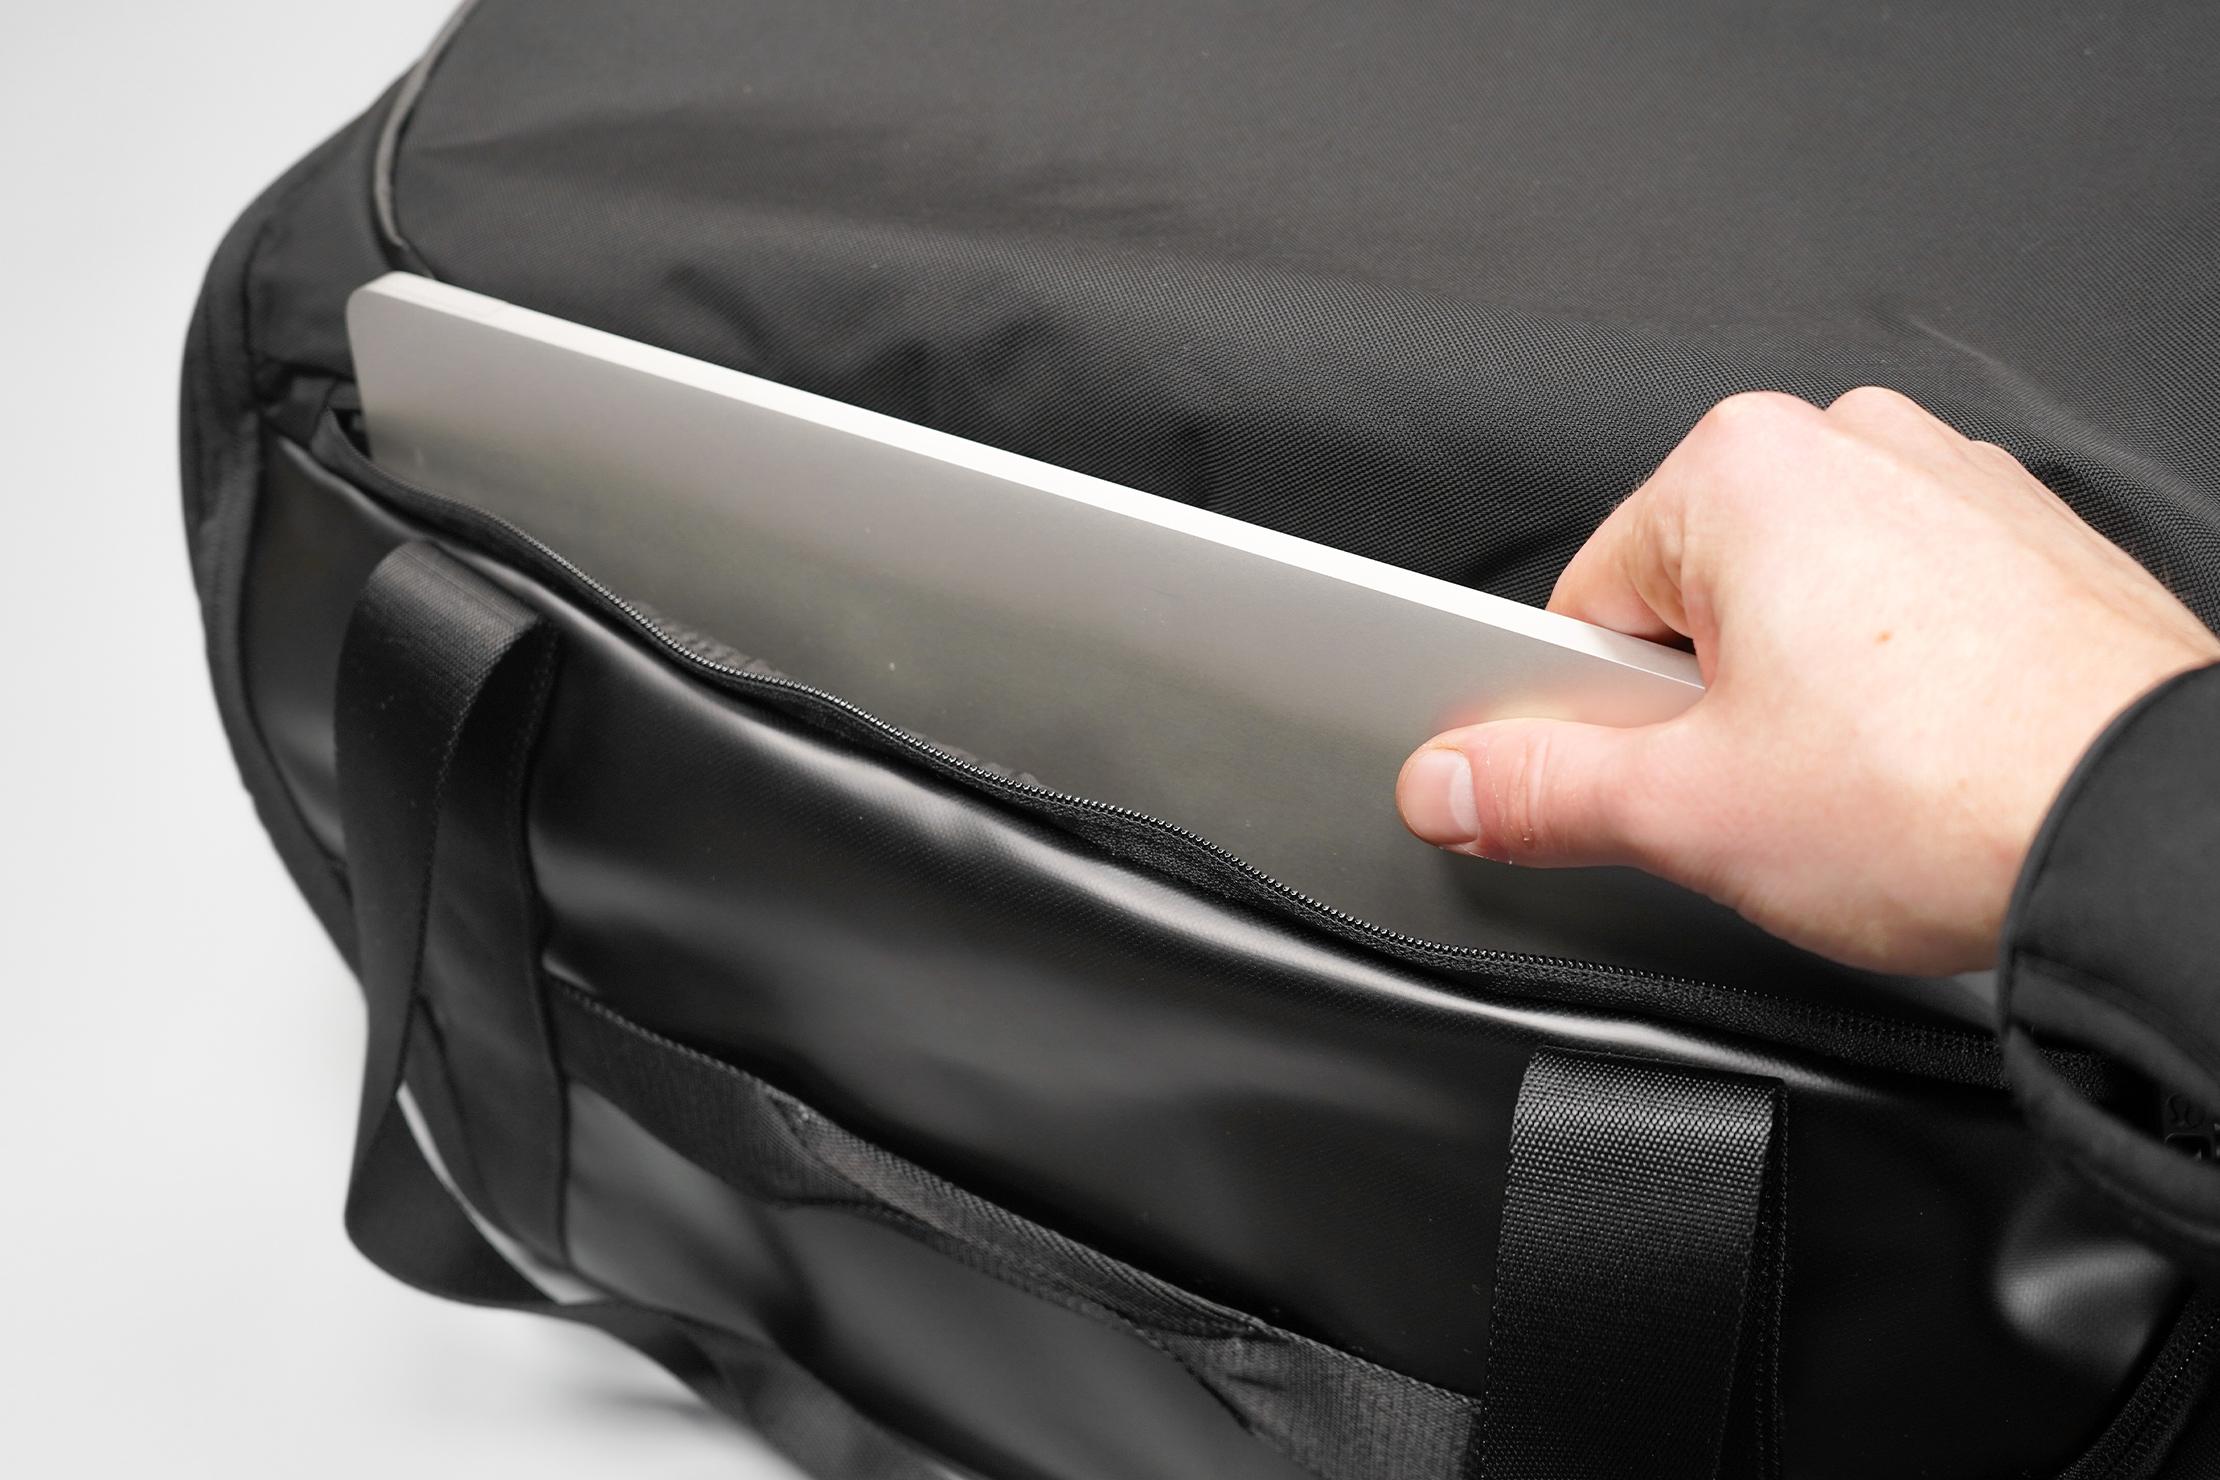 lululemon More Miles Duffle Laptop Compartment